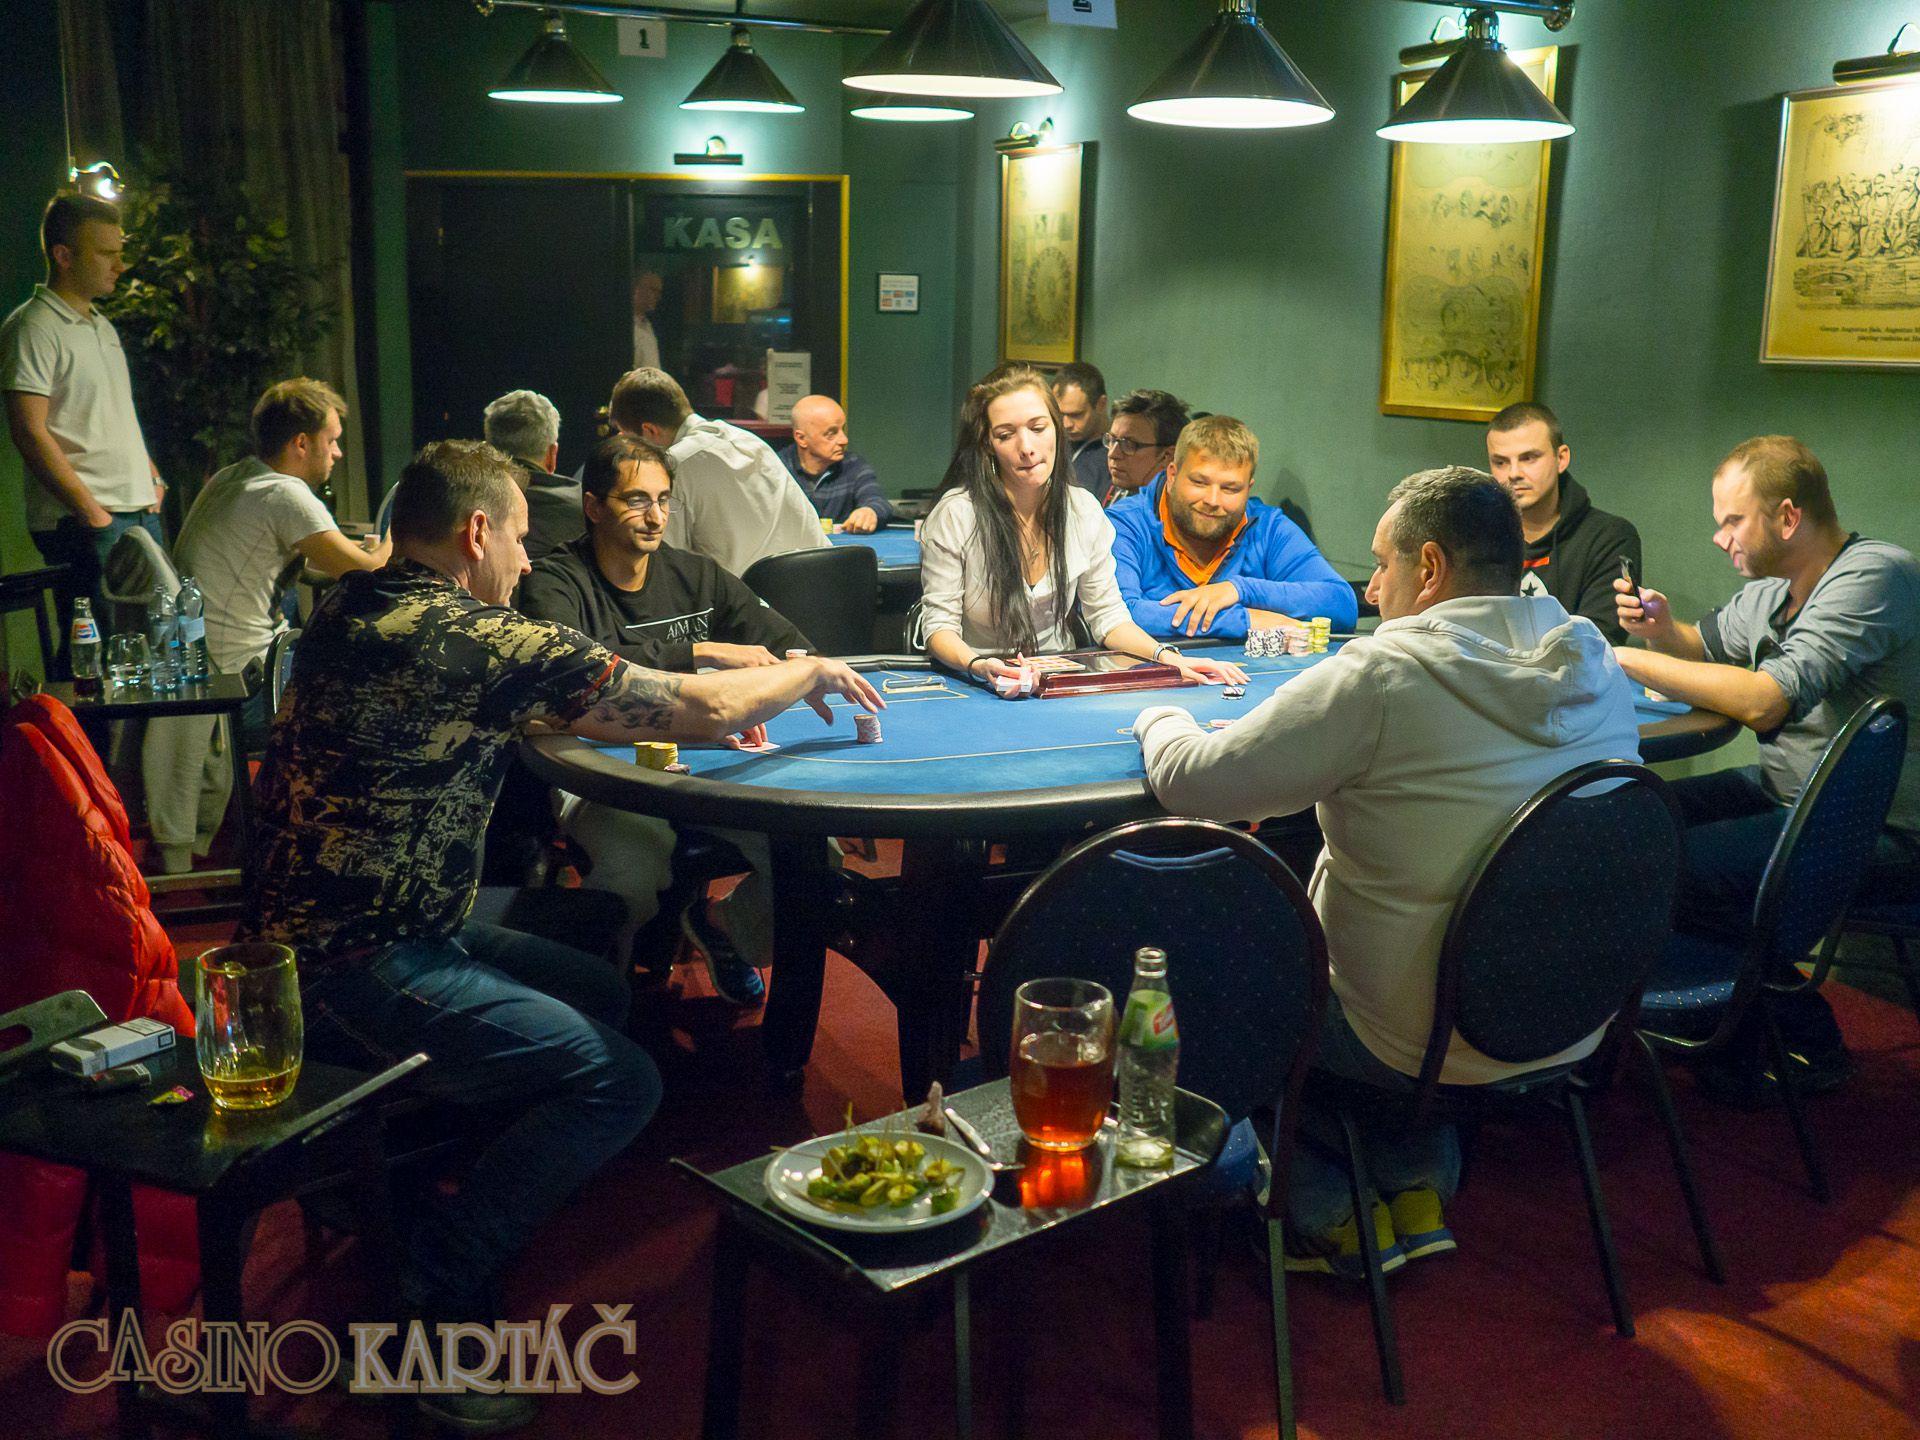 ostrava casino